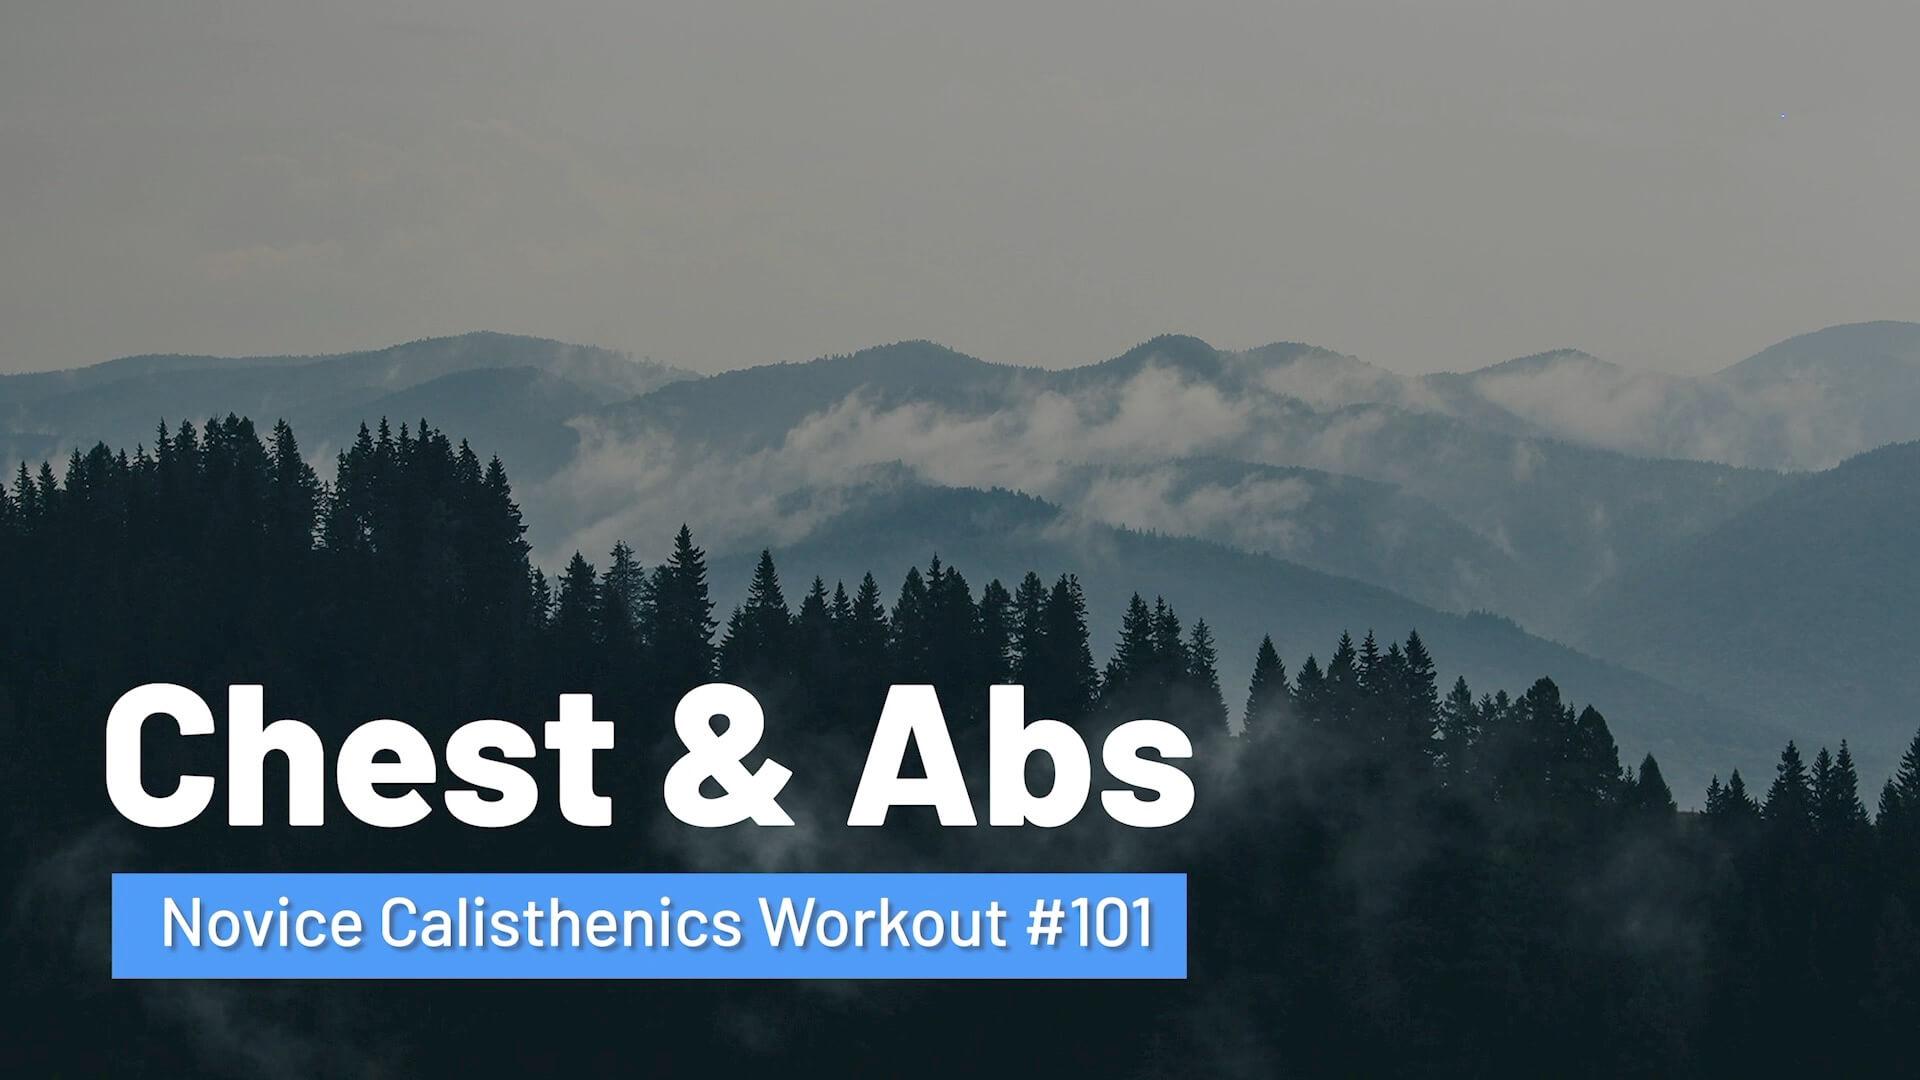 Workout #101